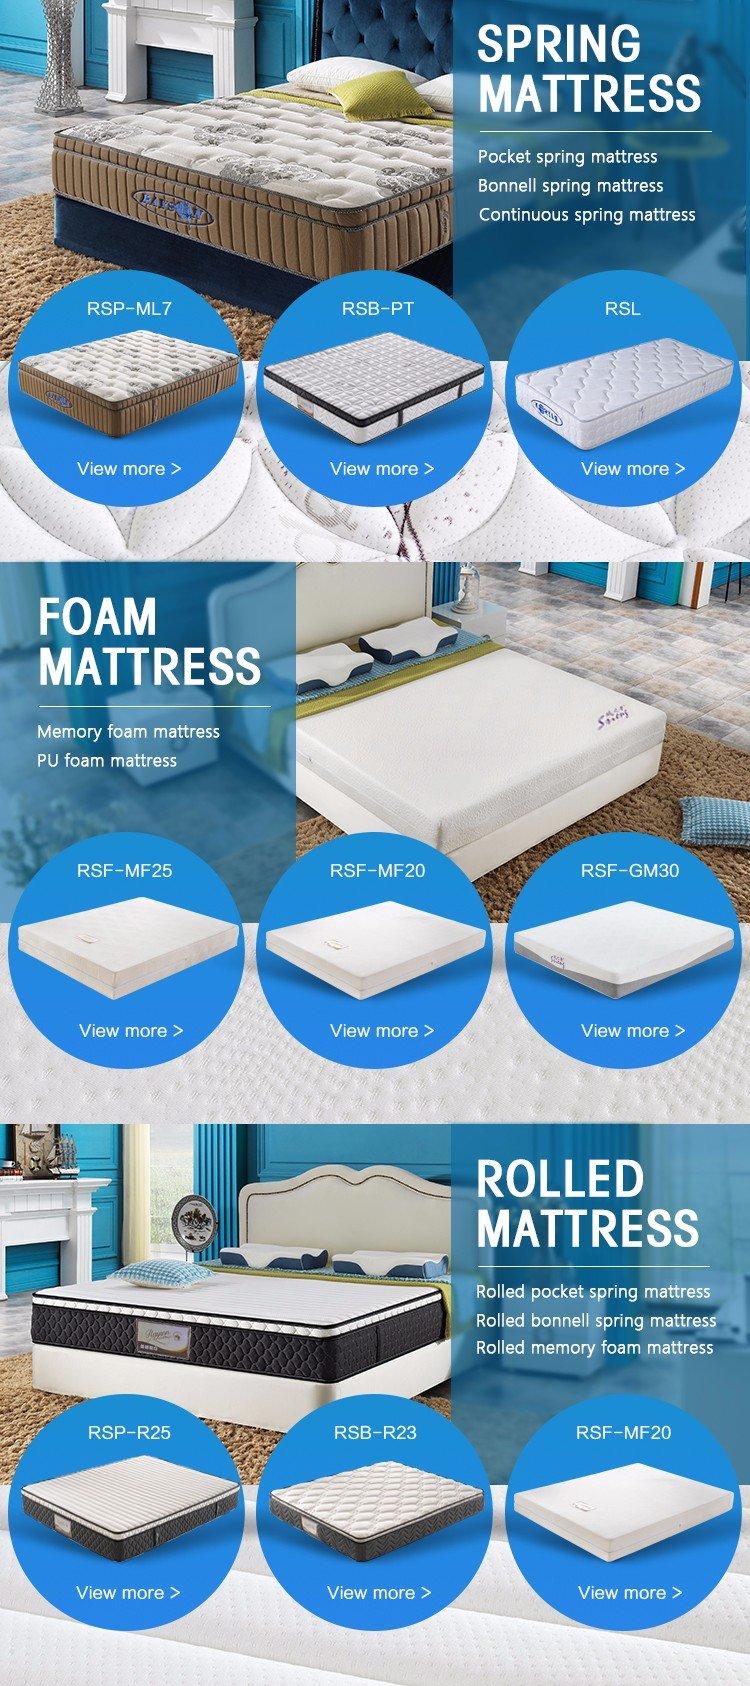 Rayson Mattress High-quality pocket sprung double mattress best price Supply-9